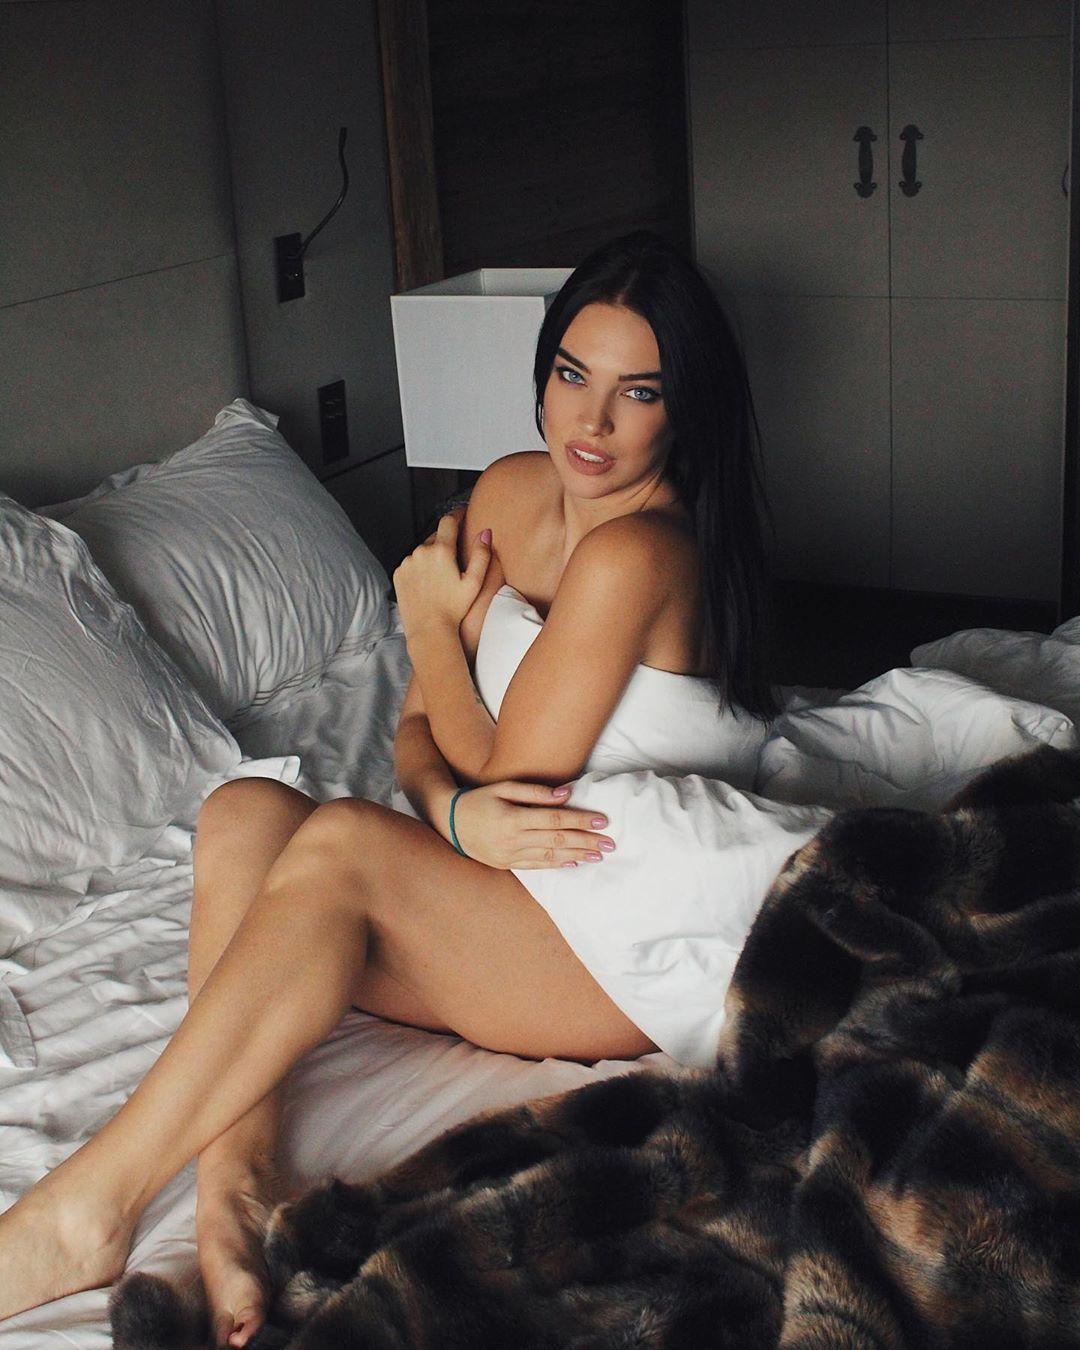 Dasha Dereviankina near nude pics